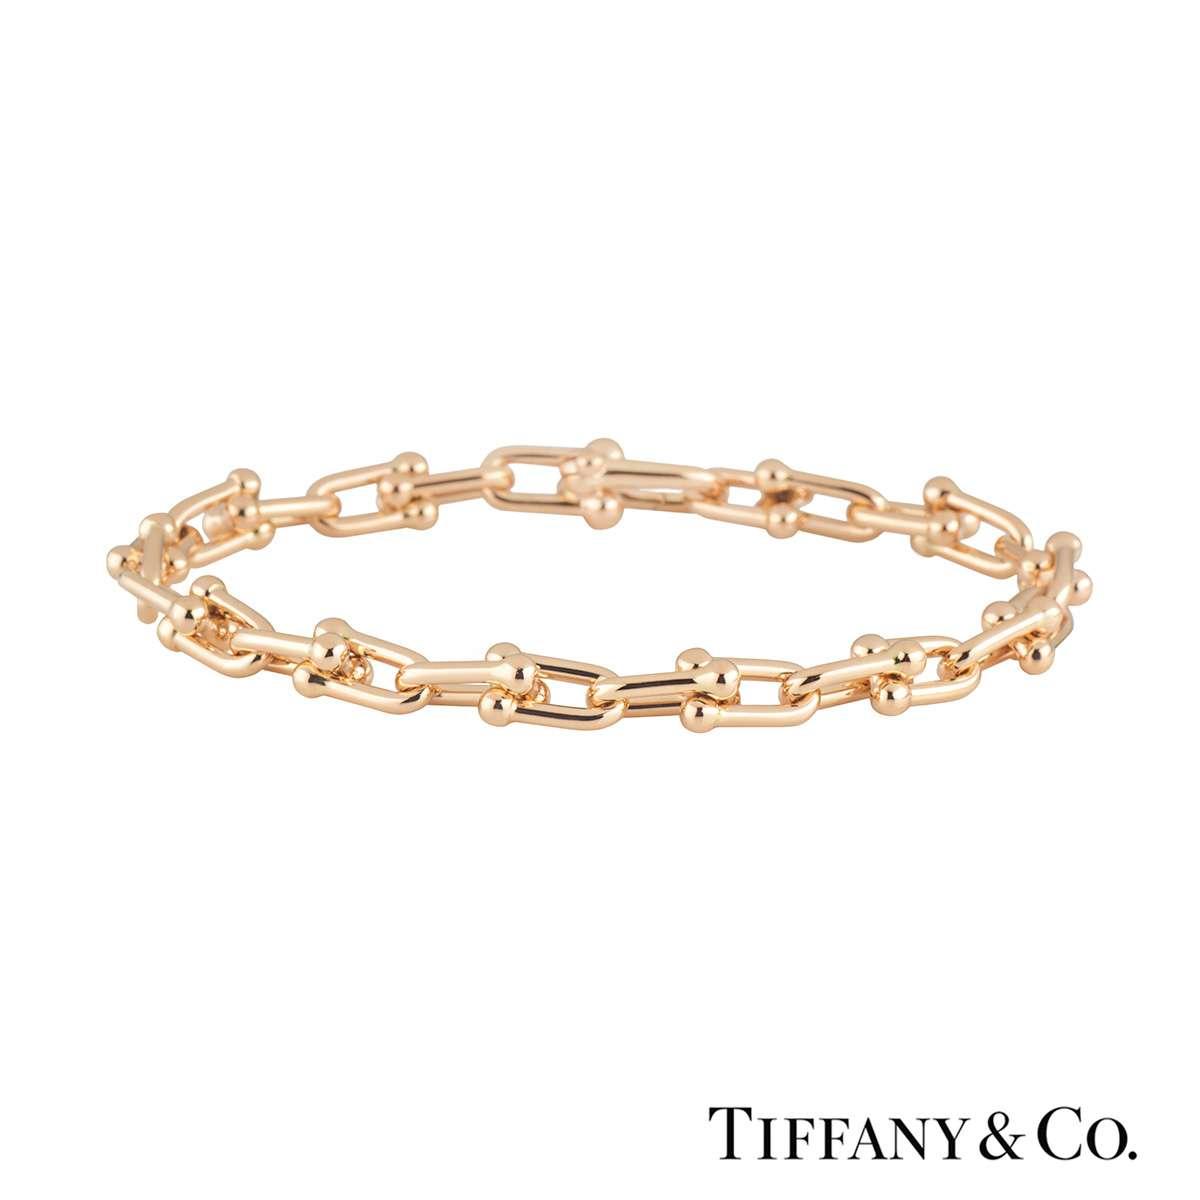 Tiffany & Co. Rose Gold City Hardwear Bracelet